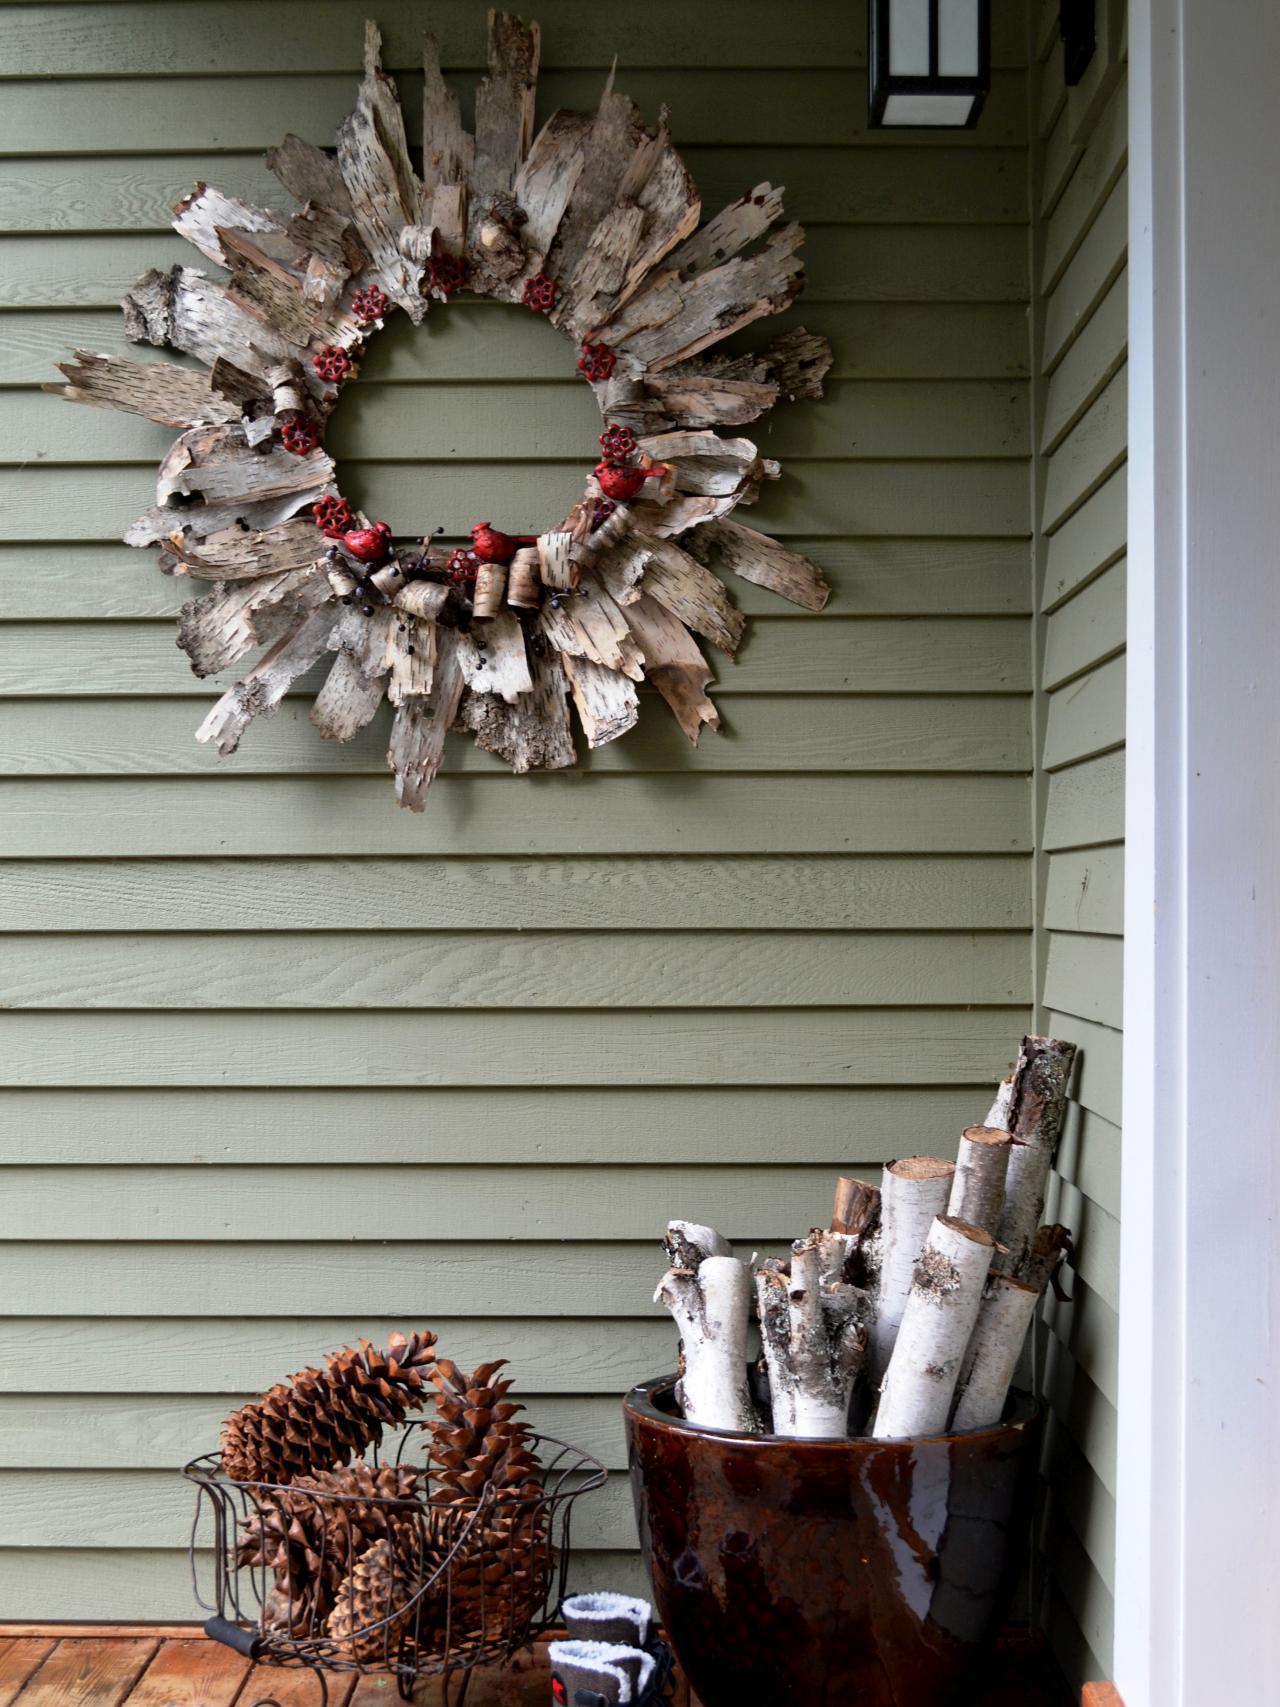 Outdoor wooden christmas decor - Repurposed Wood Shavings Wreaths Christmas Decoration Idea